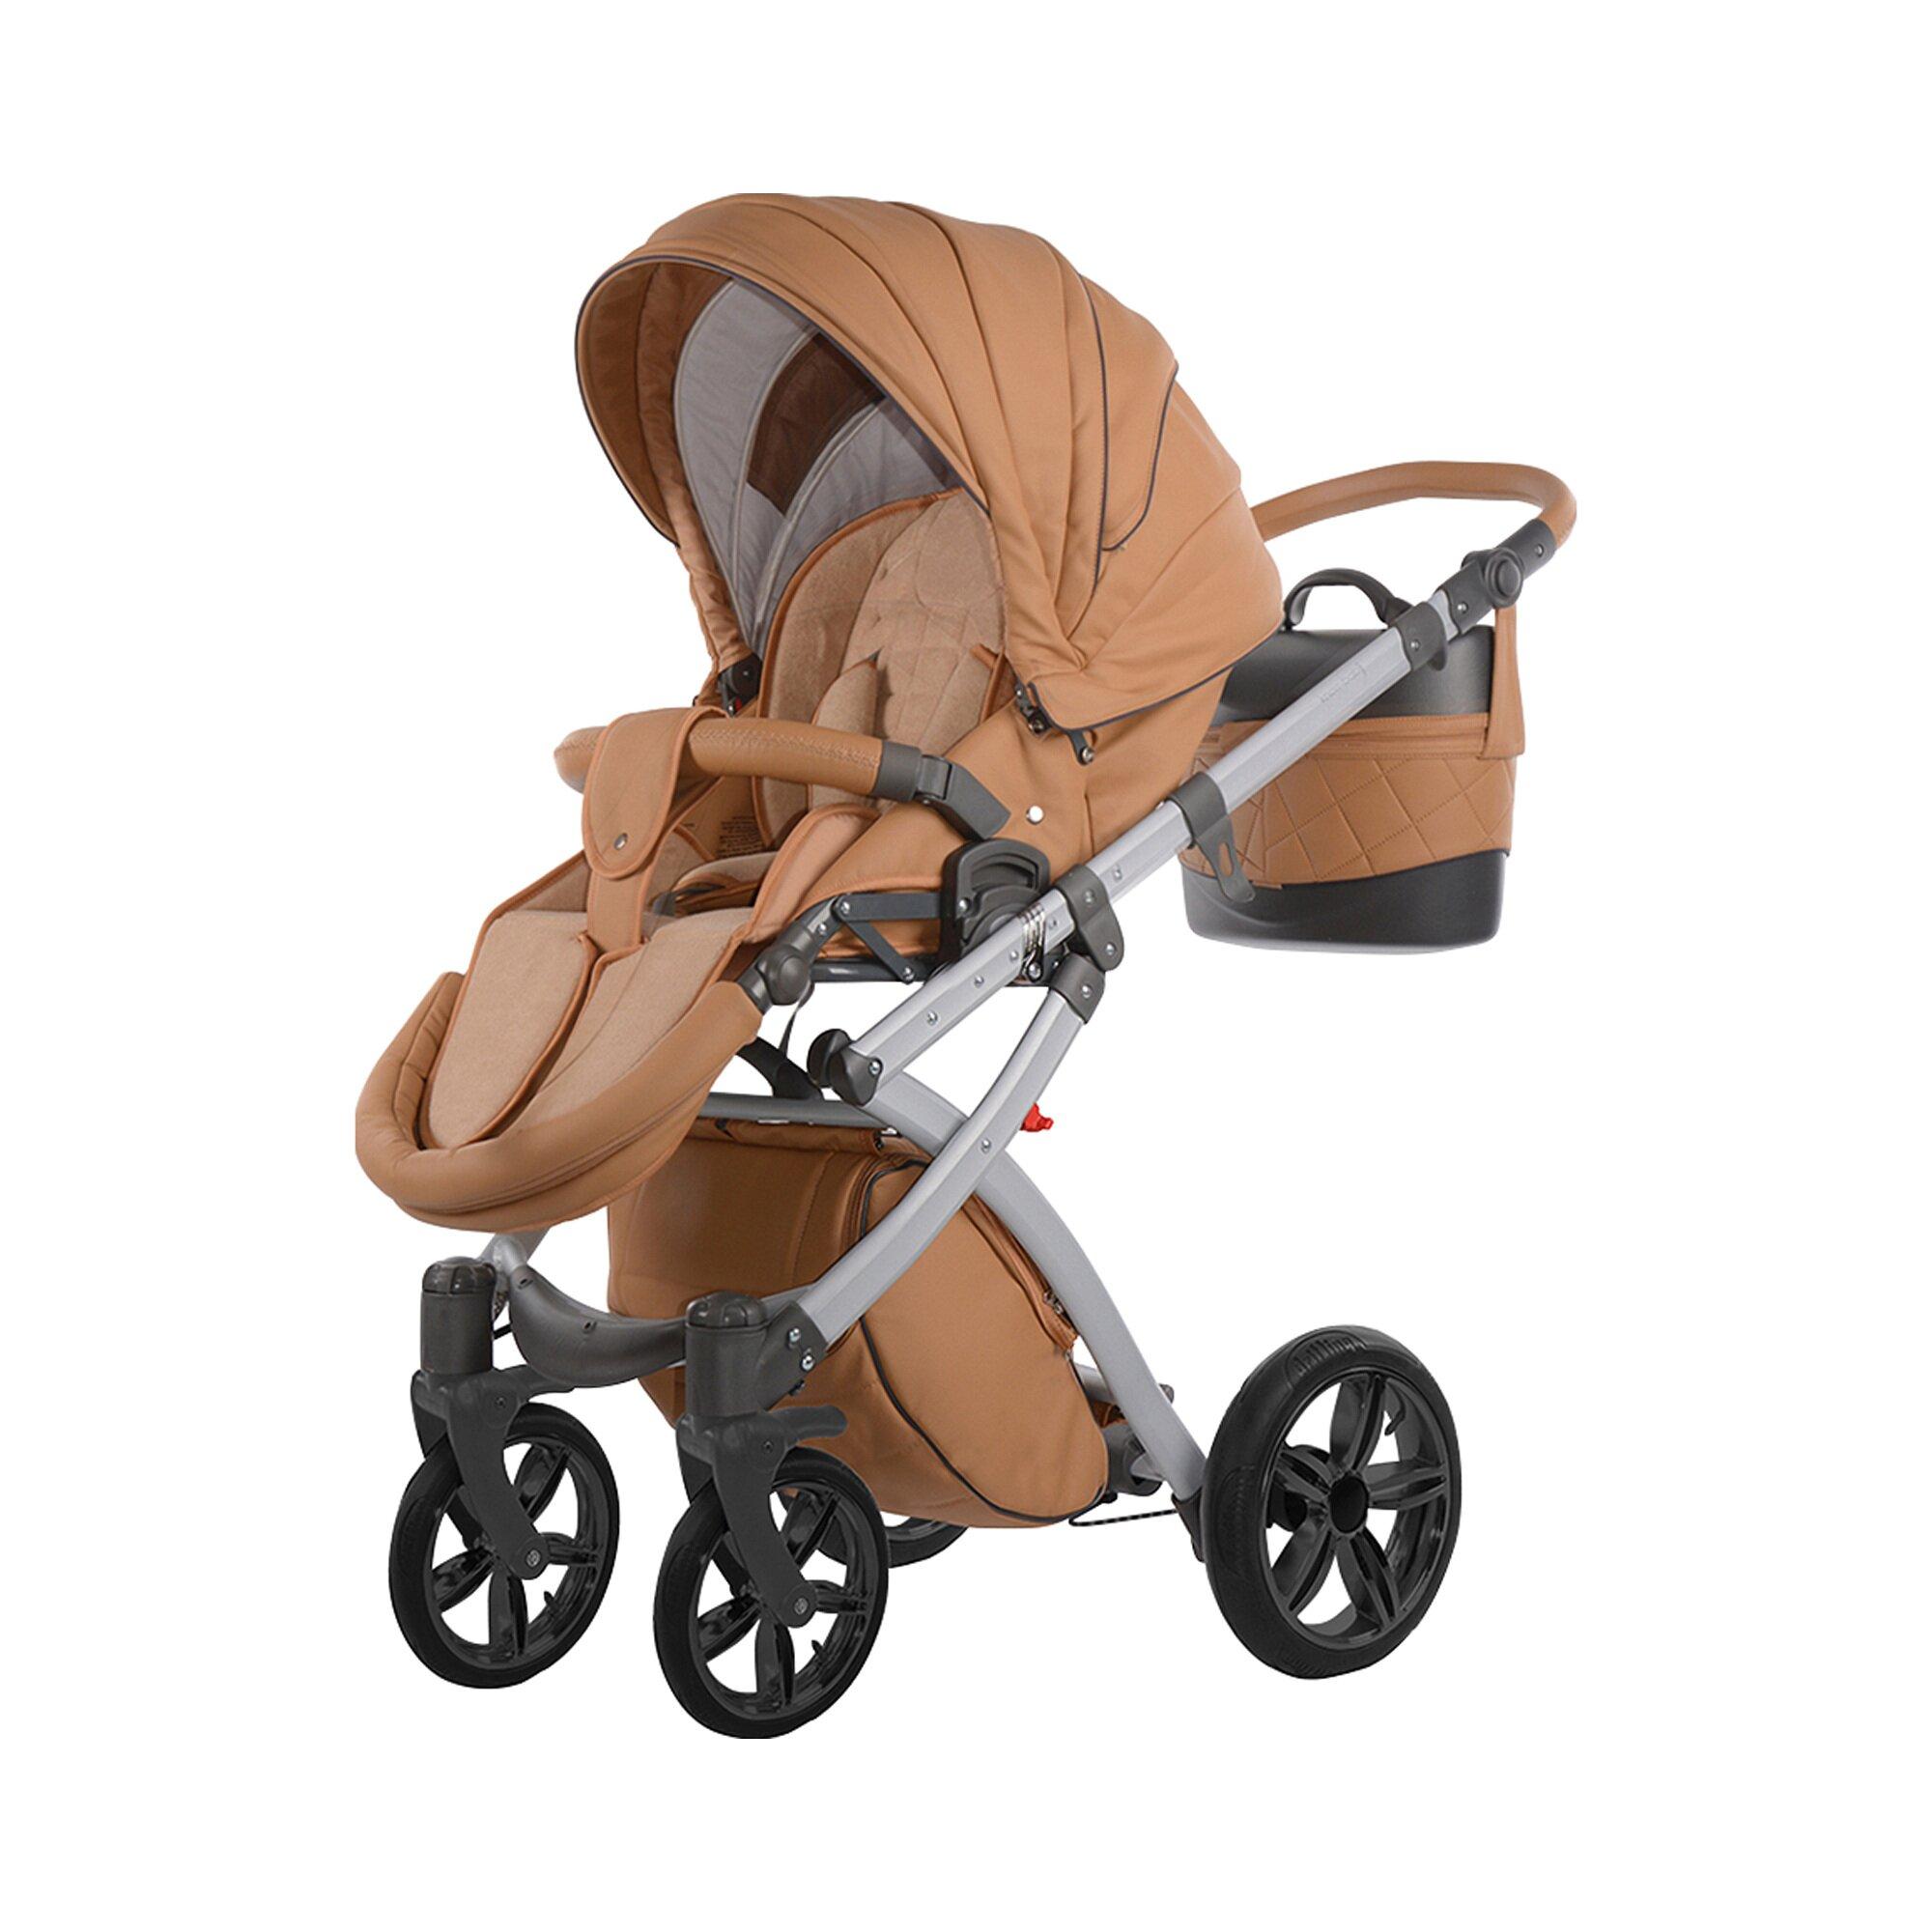 knorr-baby-alive-eco-pure-kombikinderwagen-mit-wickeltasche-beige